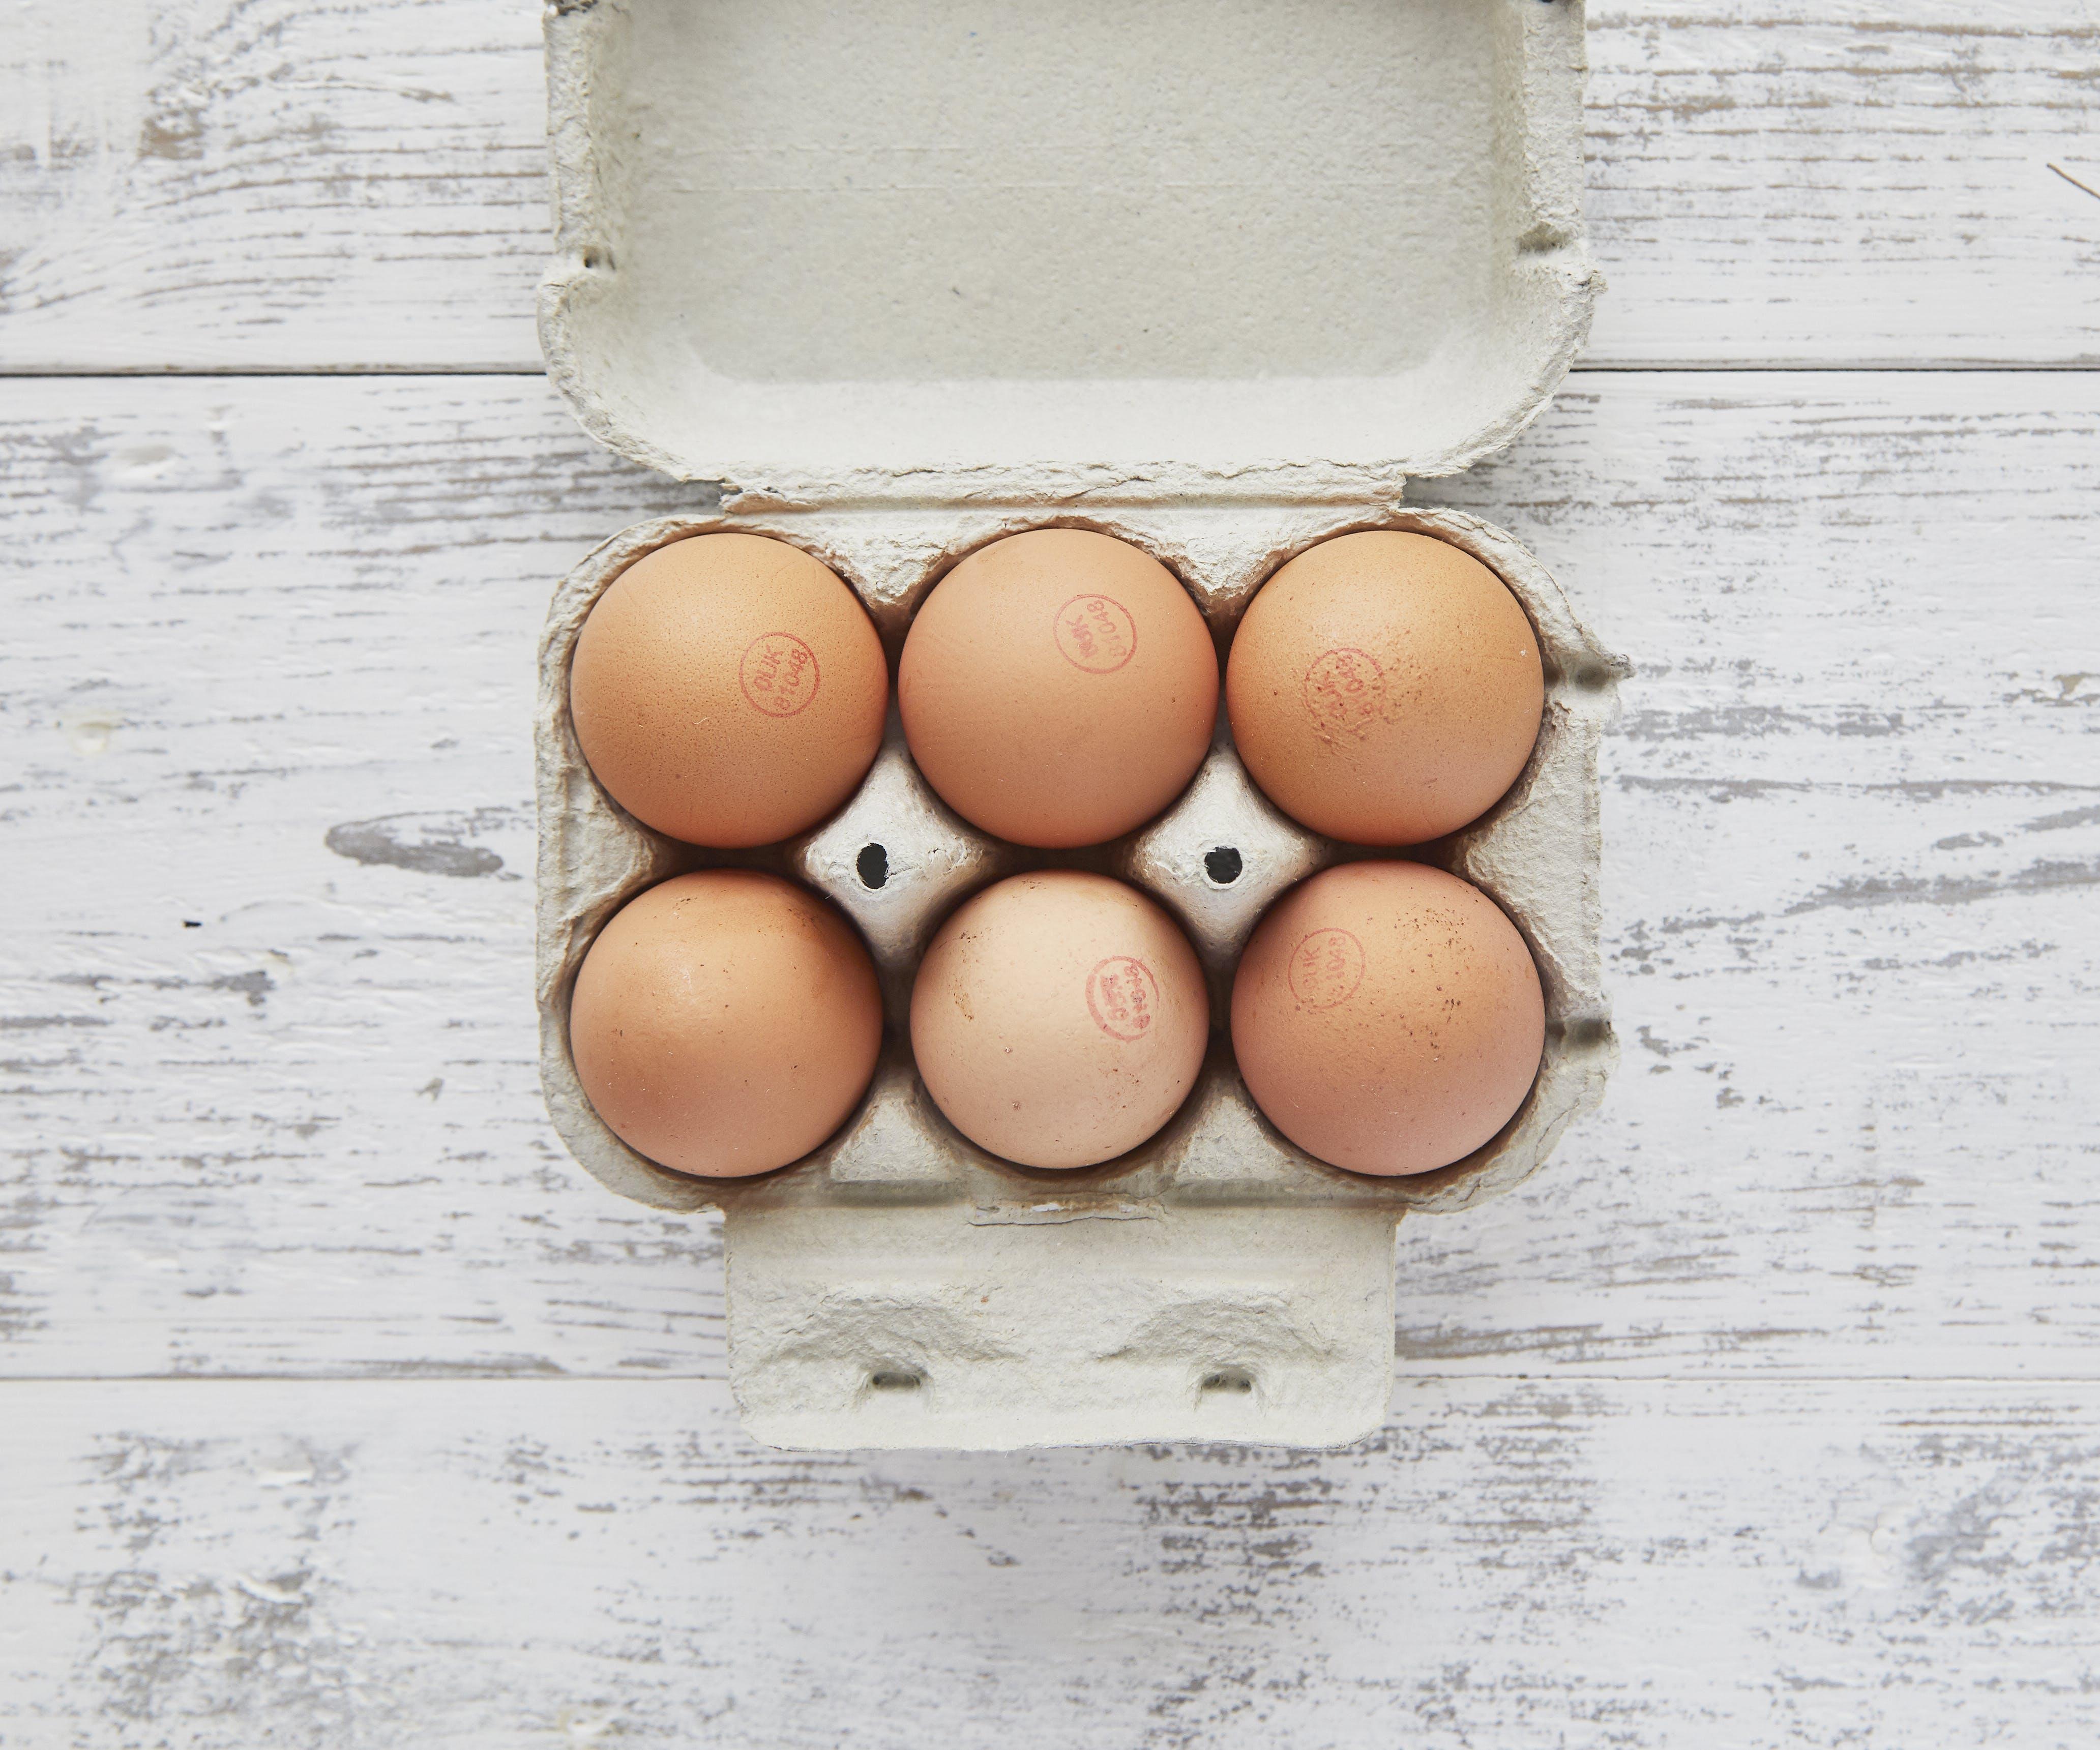 Free Range Eggs (Large)